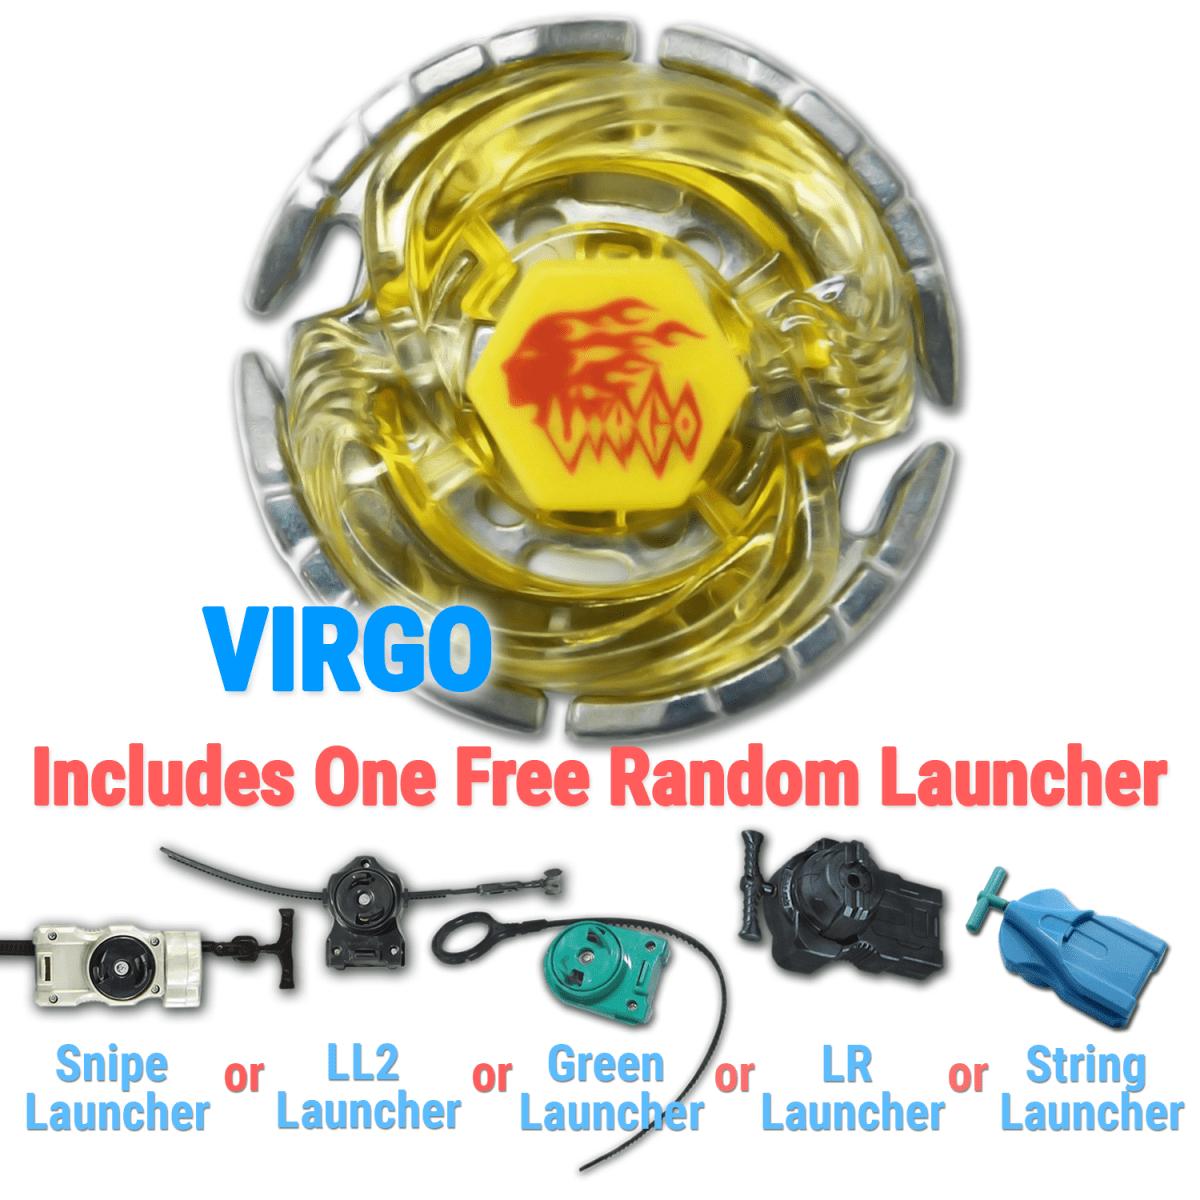 Virgo ED145ES High Performance Beyblade w/ Free Launcher ...